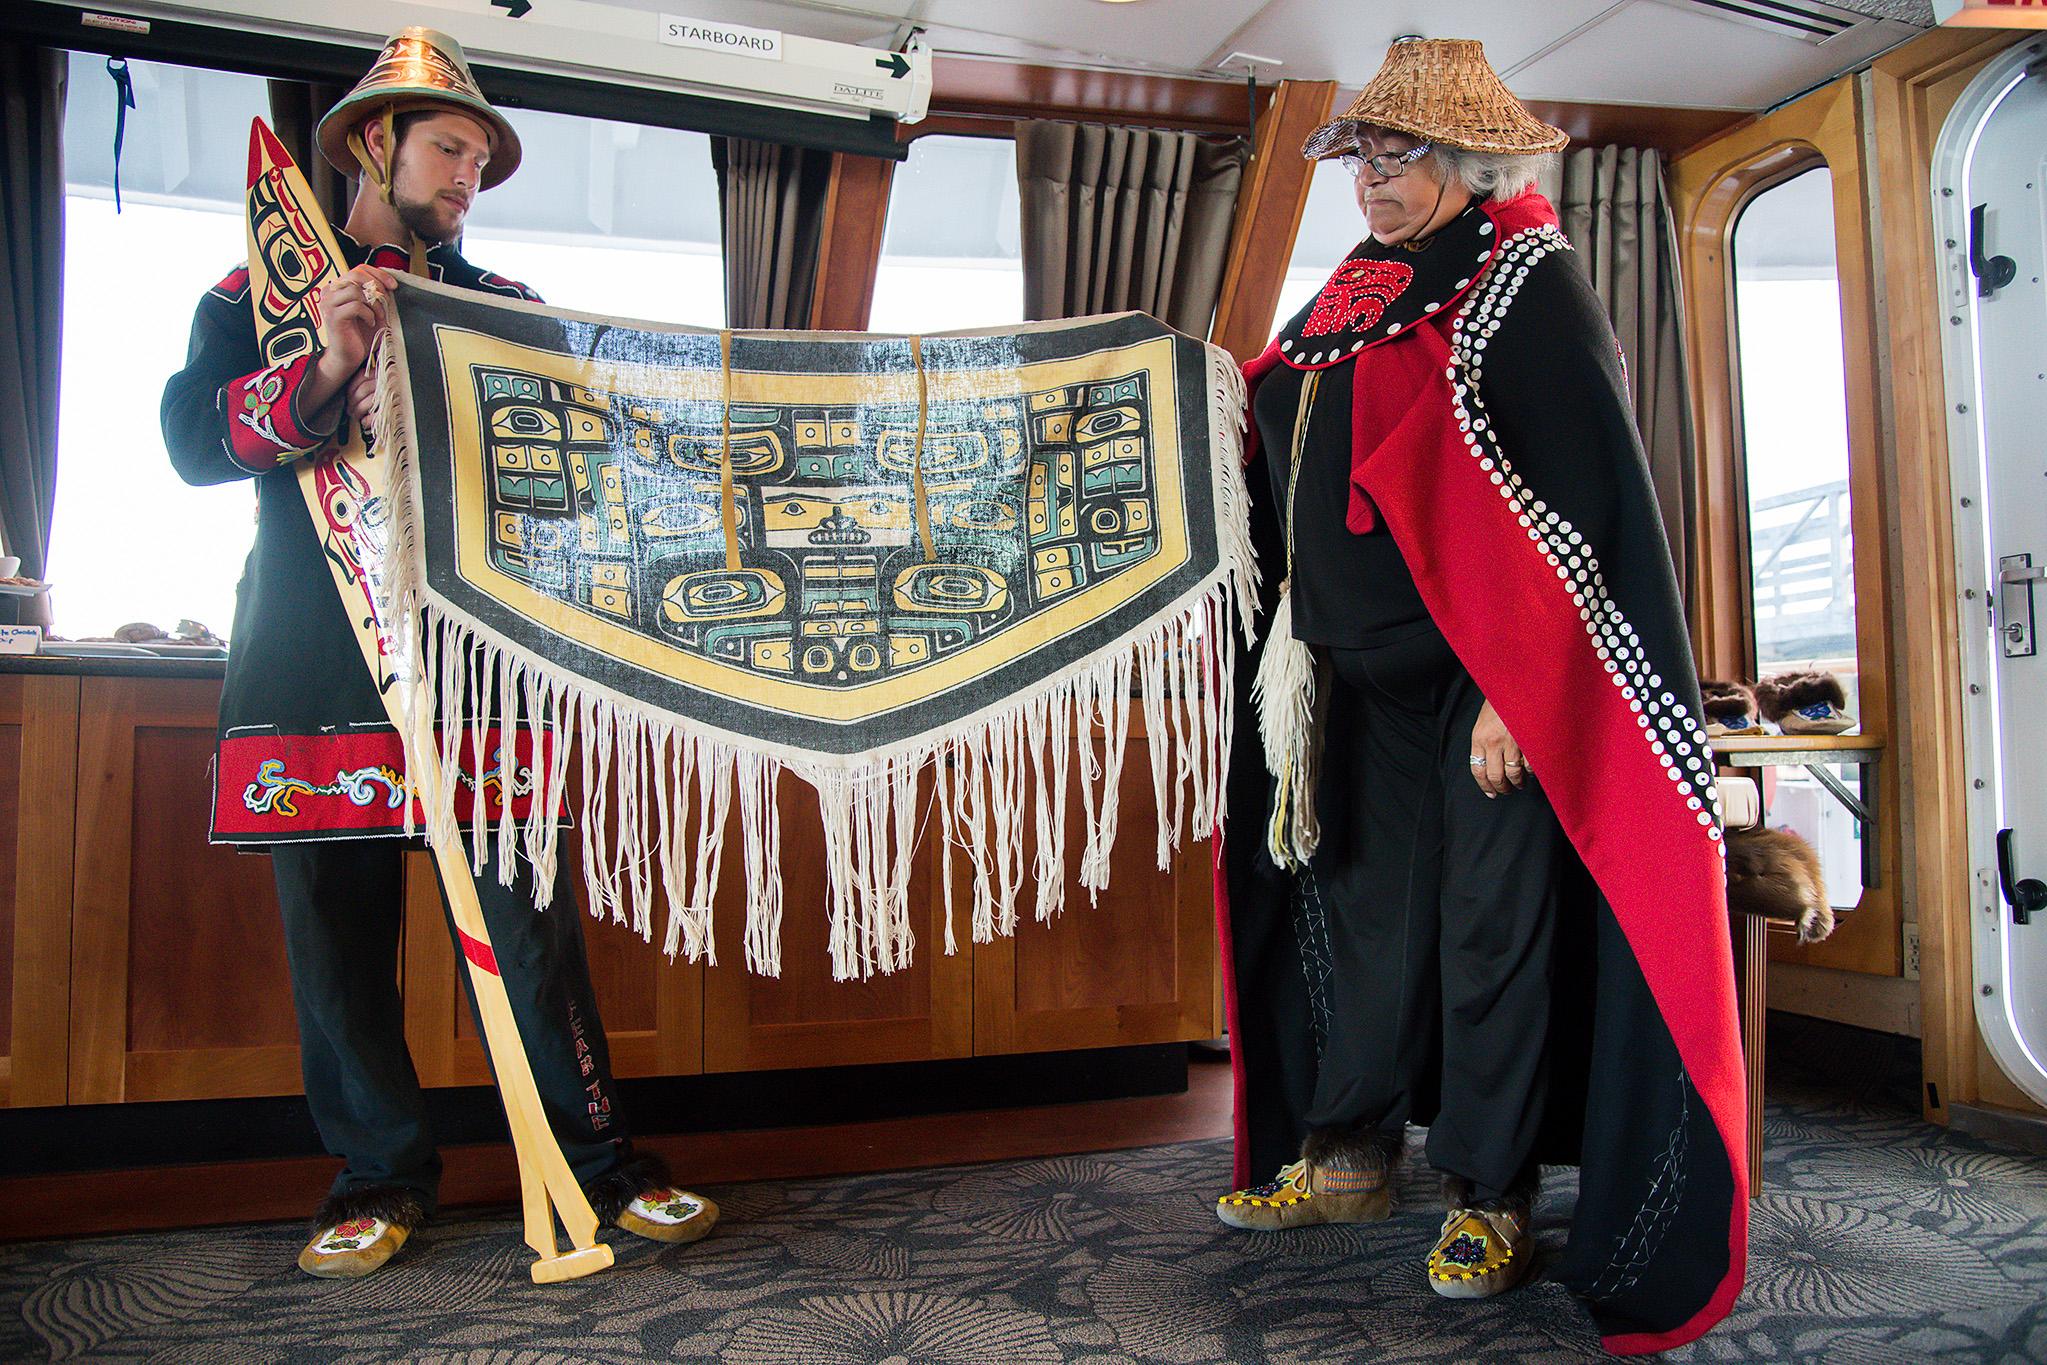 Tlingit people,native to SE Alaska,shared their handiwork and stories on board.